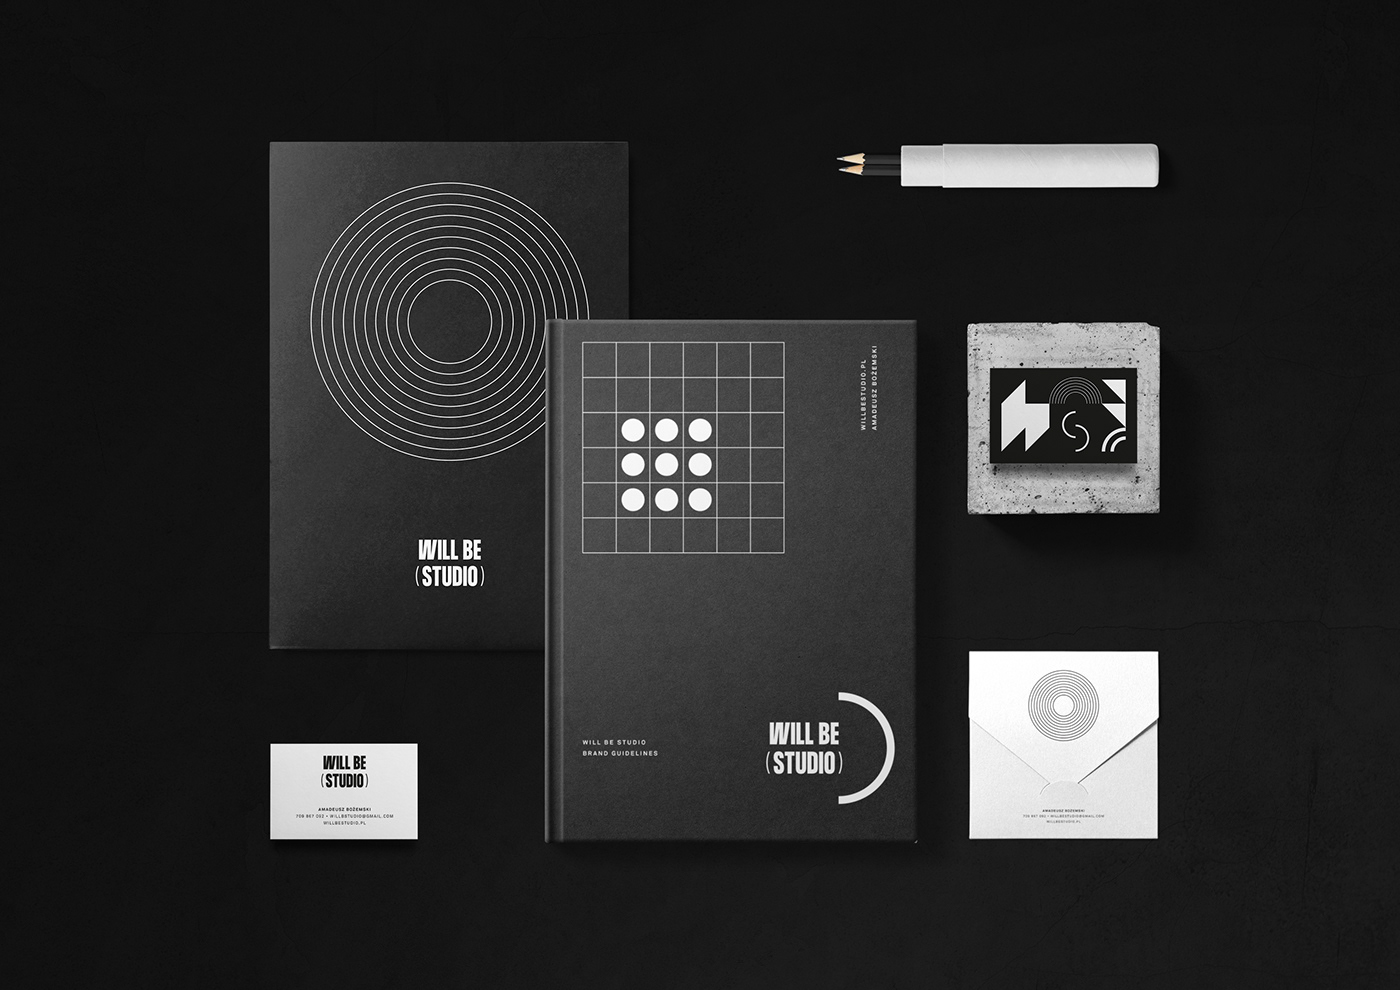 logo visualization Render architecture interior design  furniture poster cover brand guidelines Stationery